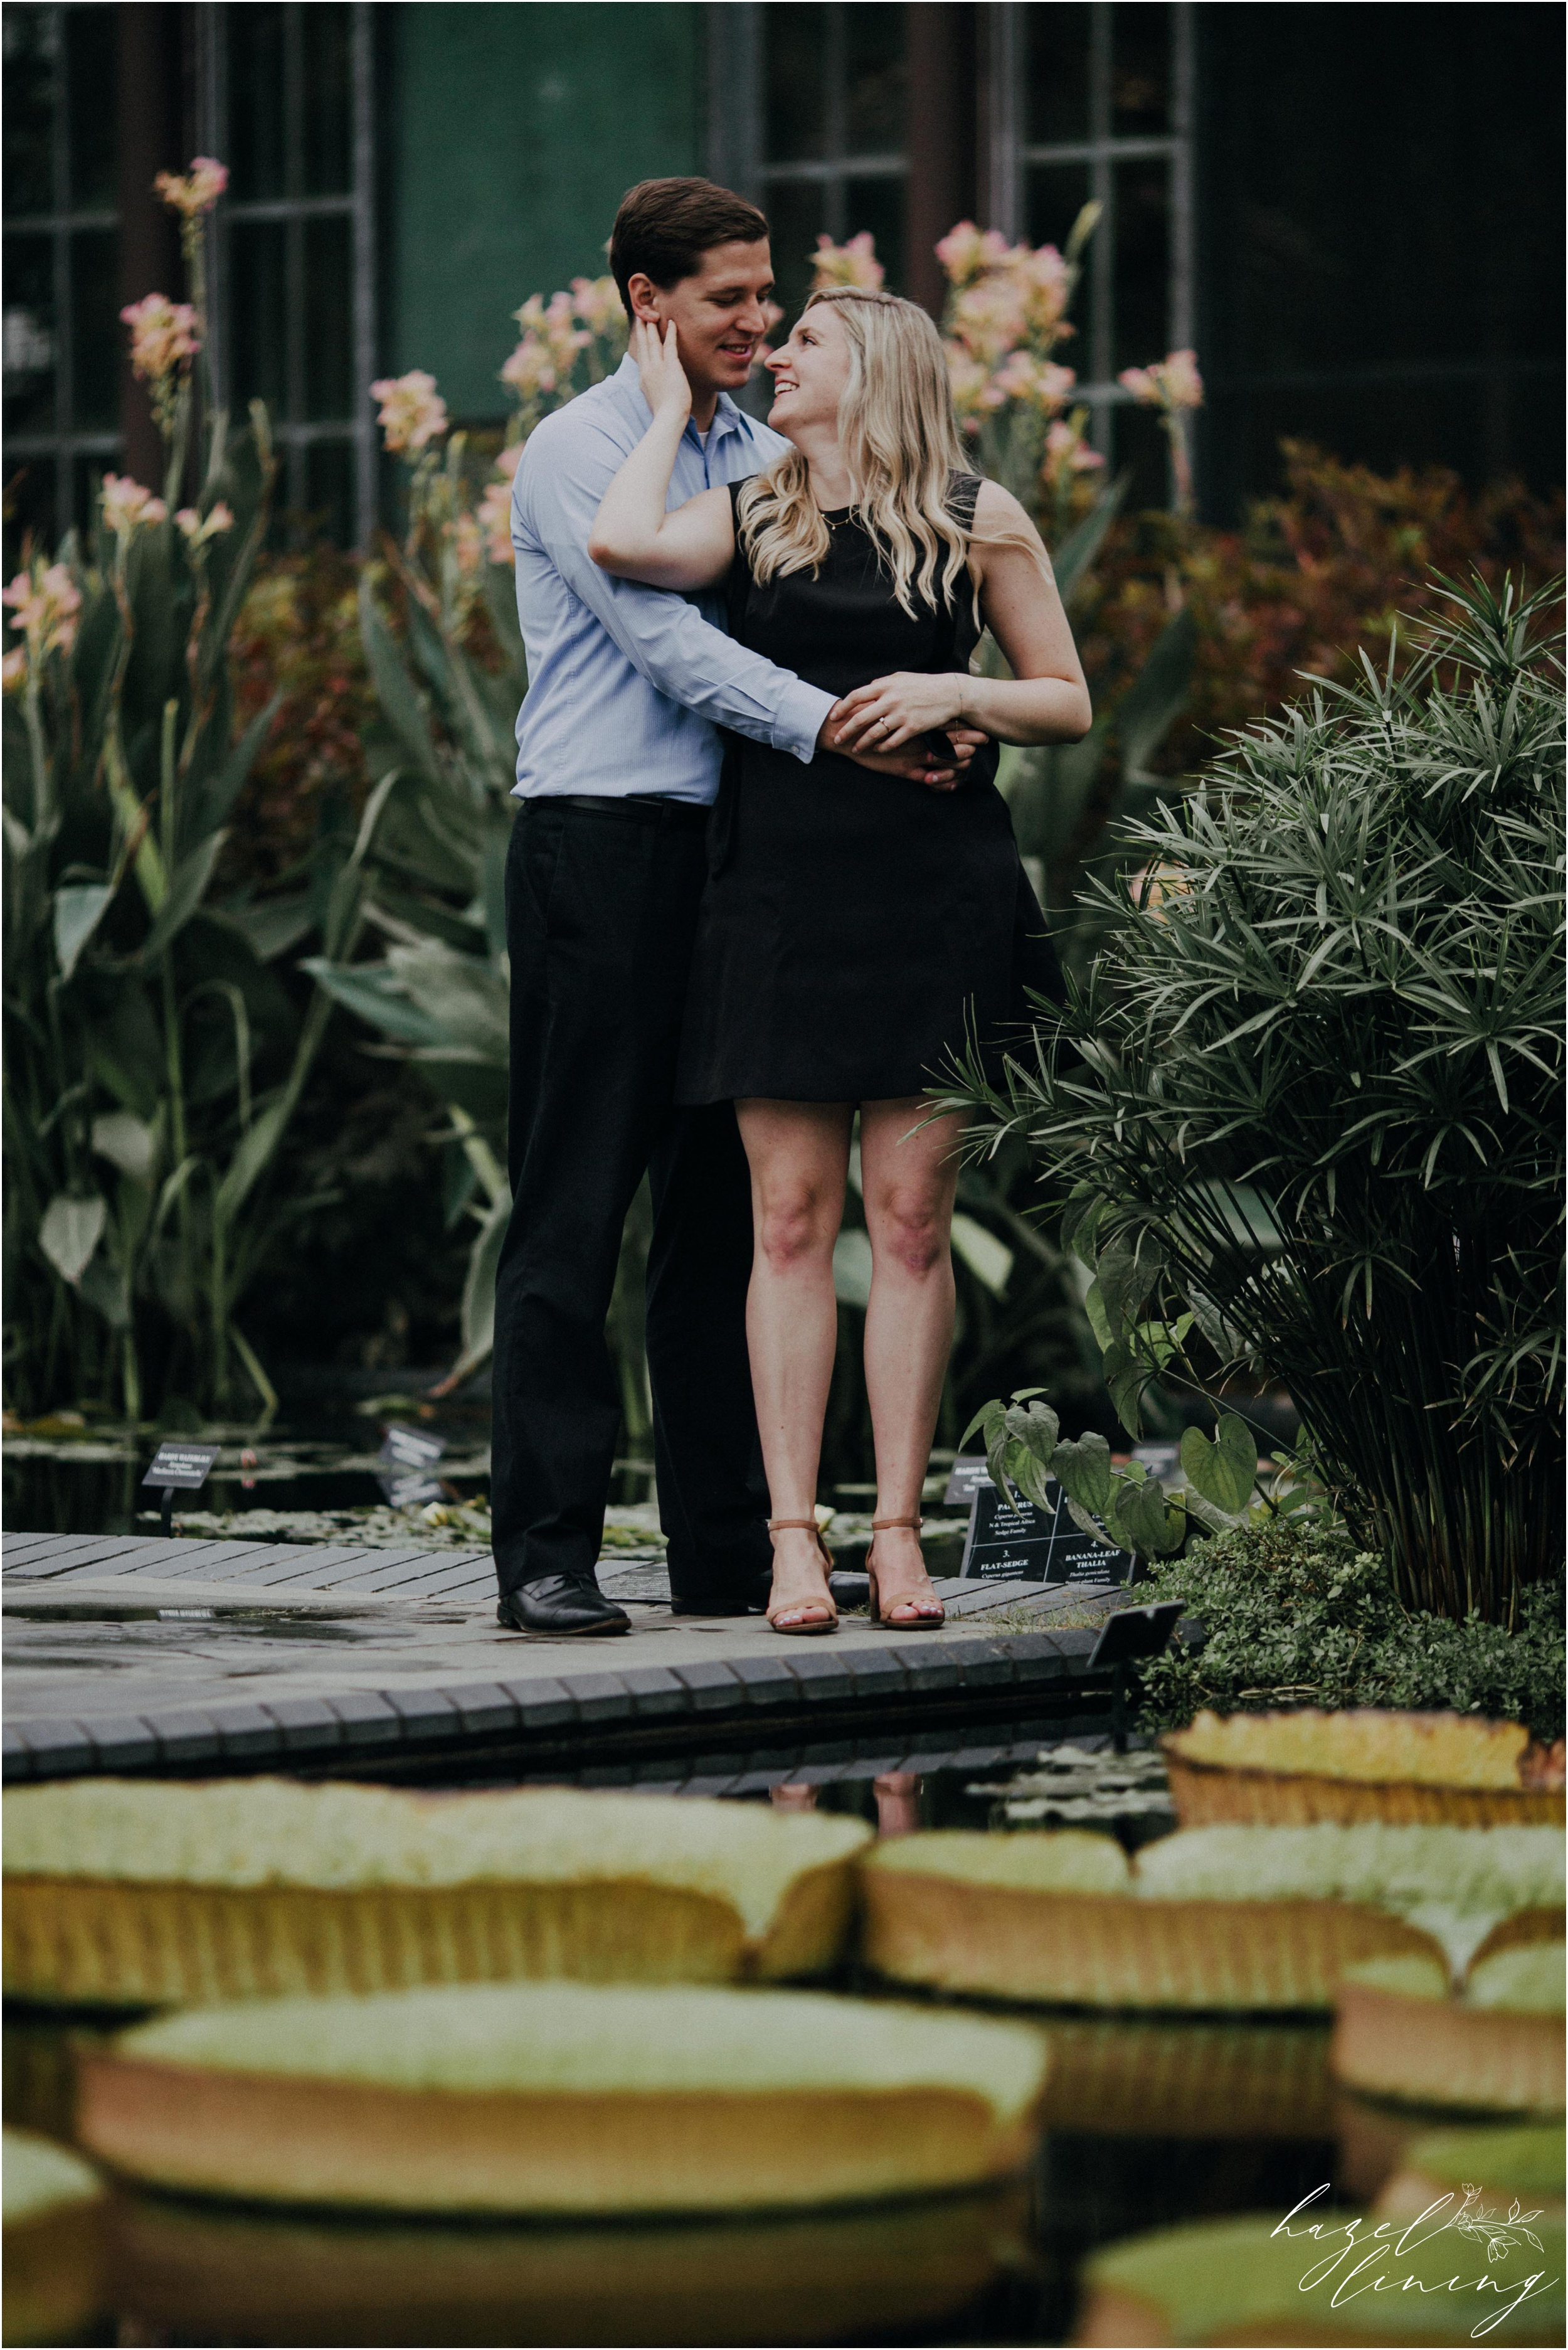 victoria-travis-logan-mayes-longwood-gardens-kennett-square-philadelphia-engagement-session-hazel-lining-photography-destination-elopement-wedding-engagement-photography_0043.jpg